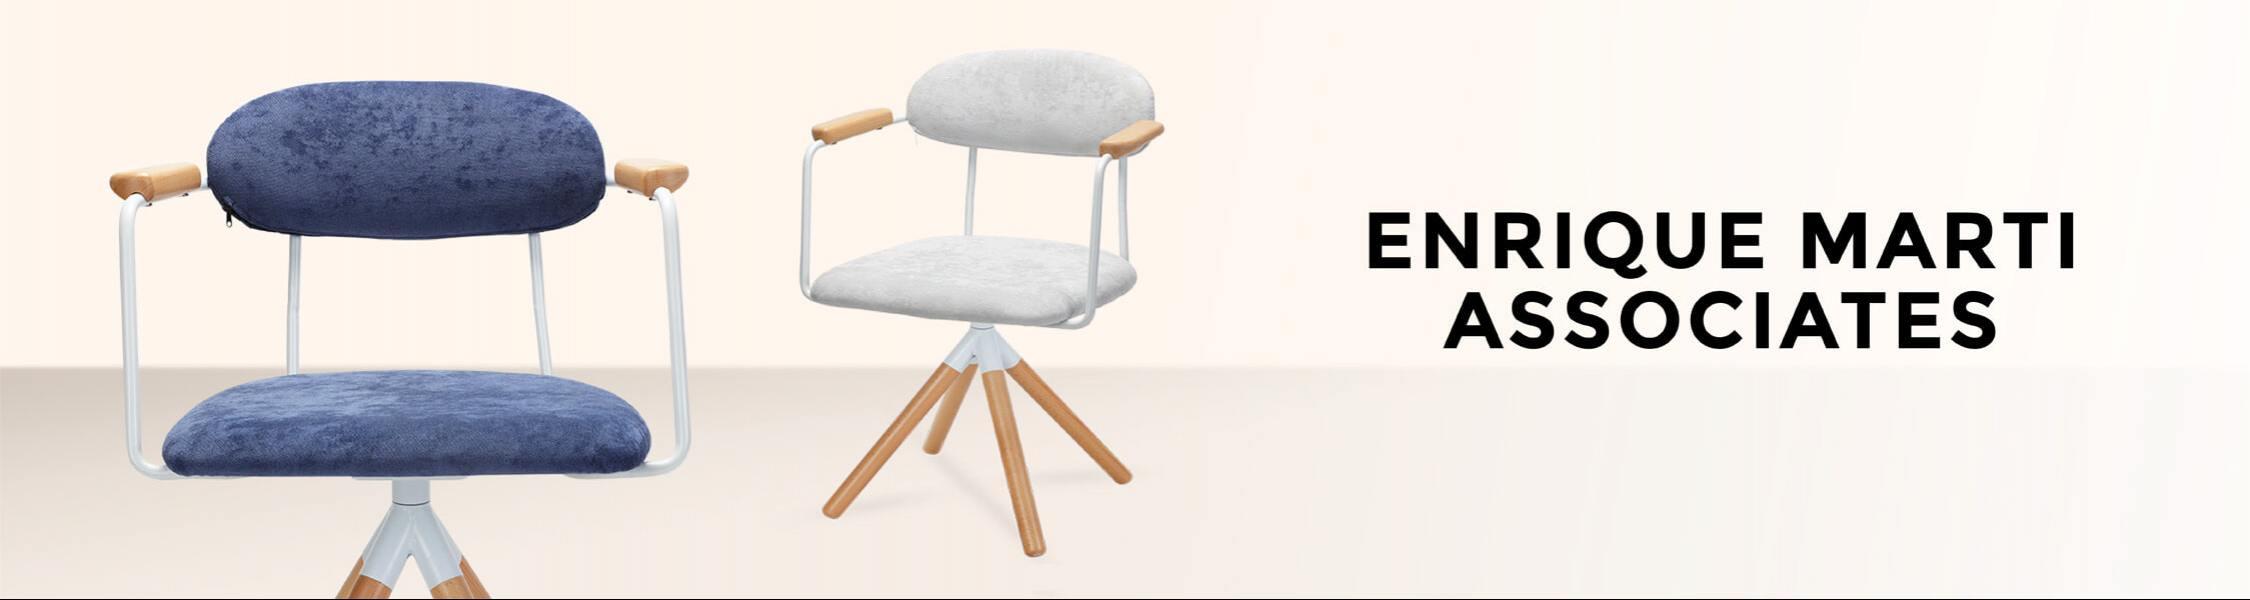 Enrique Marti Associates